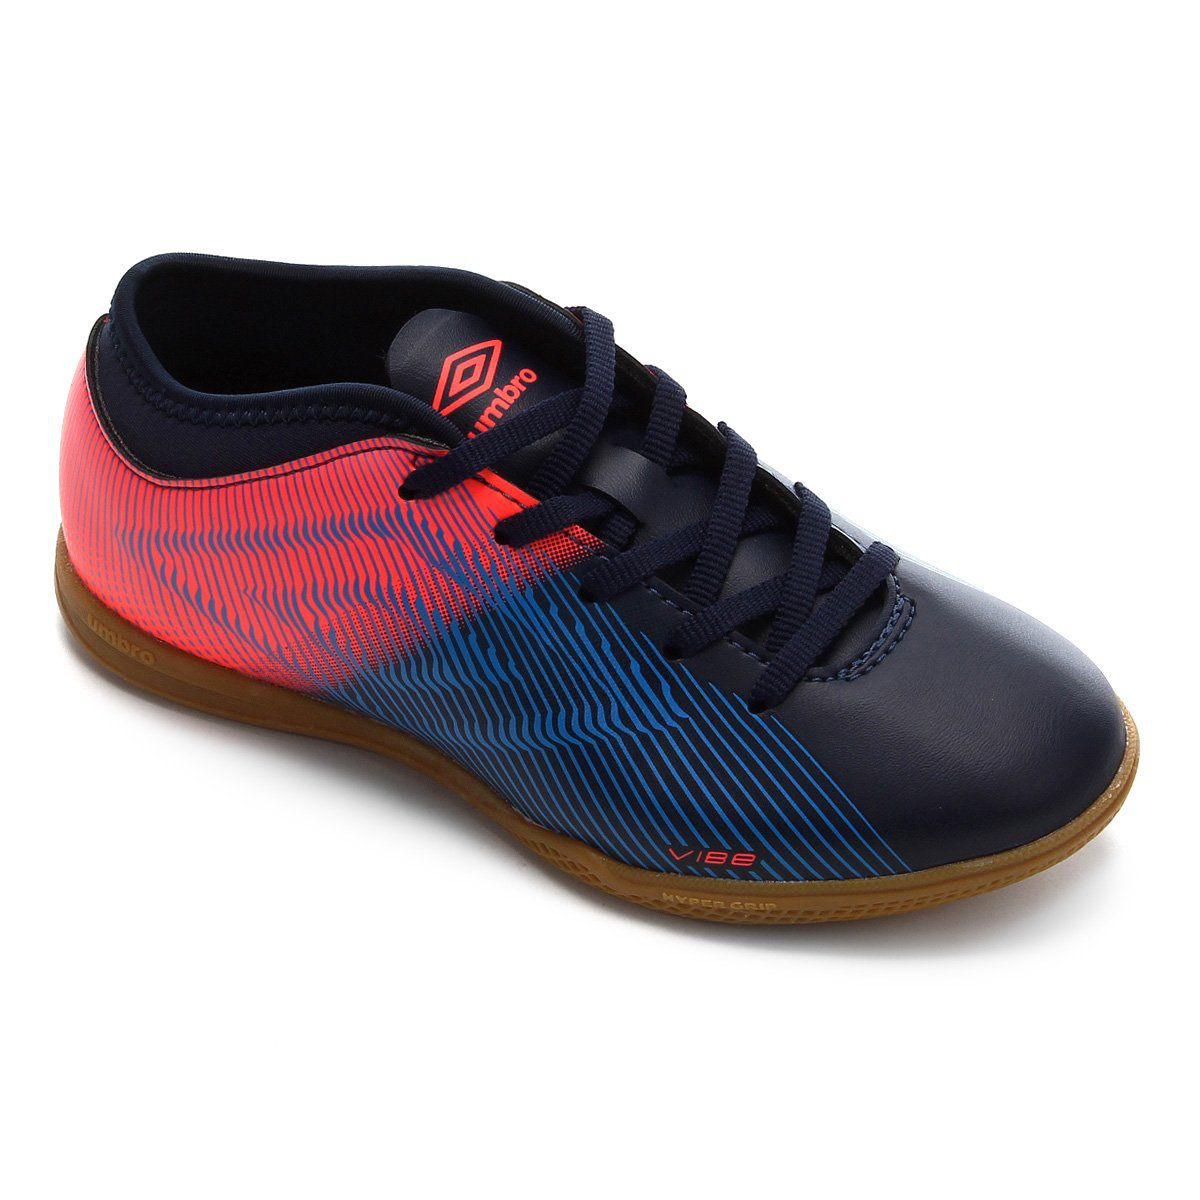 Chuteira Umbro Futsal Vibe II Jr - Marinho/Coral